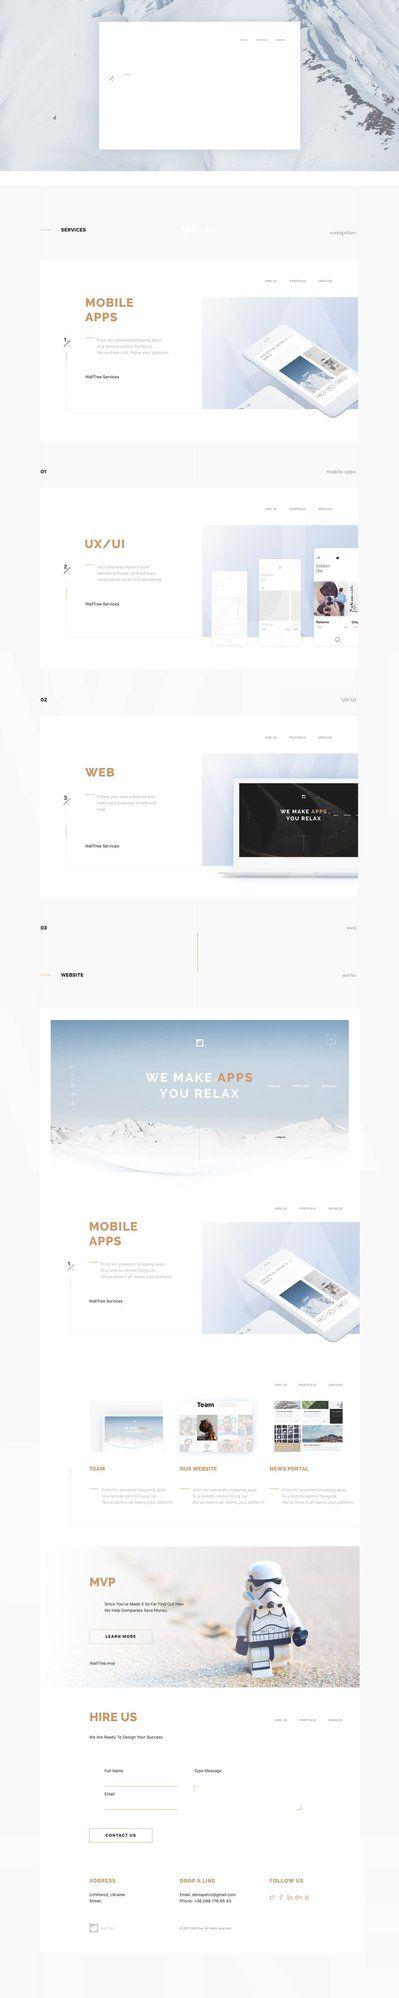 Walltree Development Company Agency Website - Behance #ui #ux #userexperience #website #webdesign #design #minimal #minimalism #art